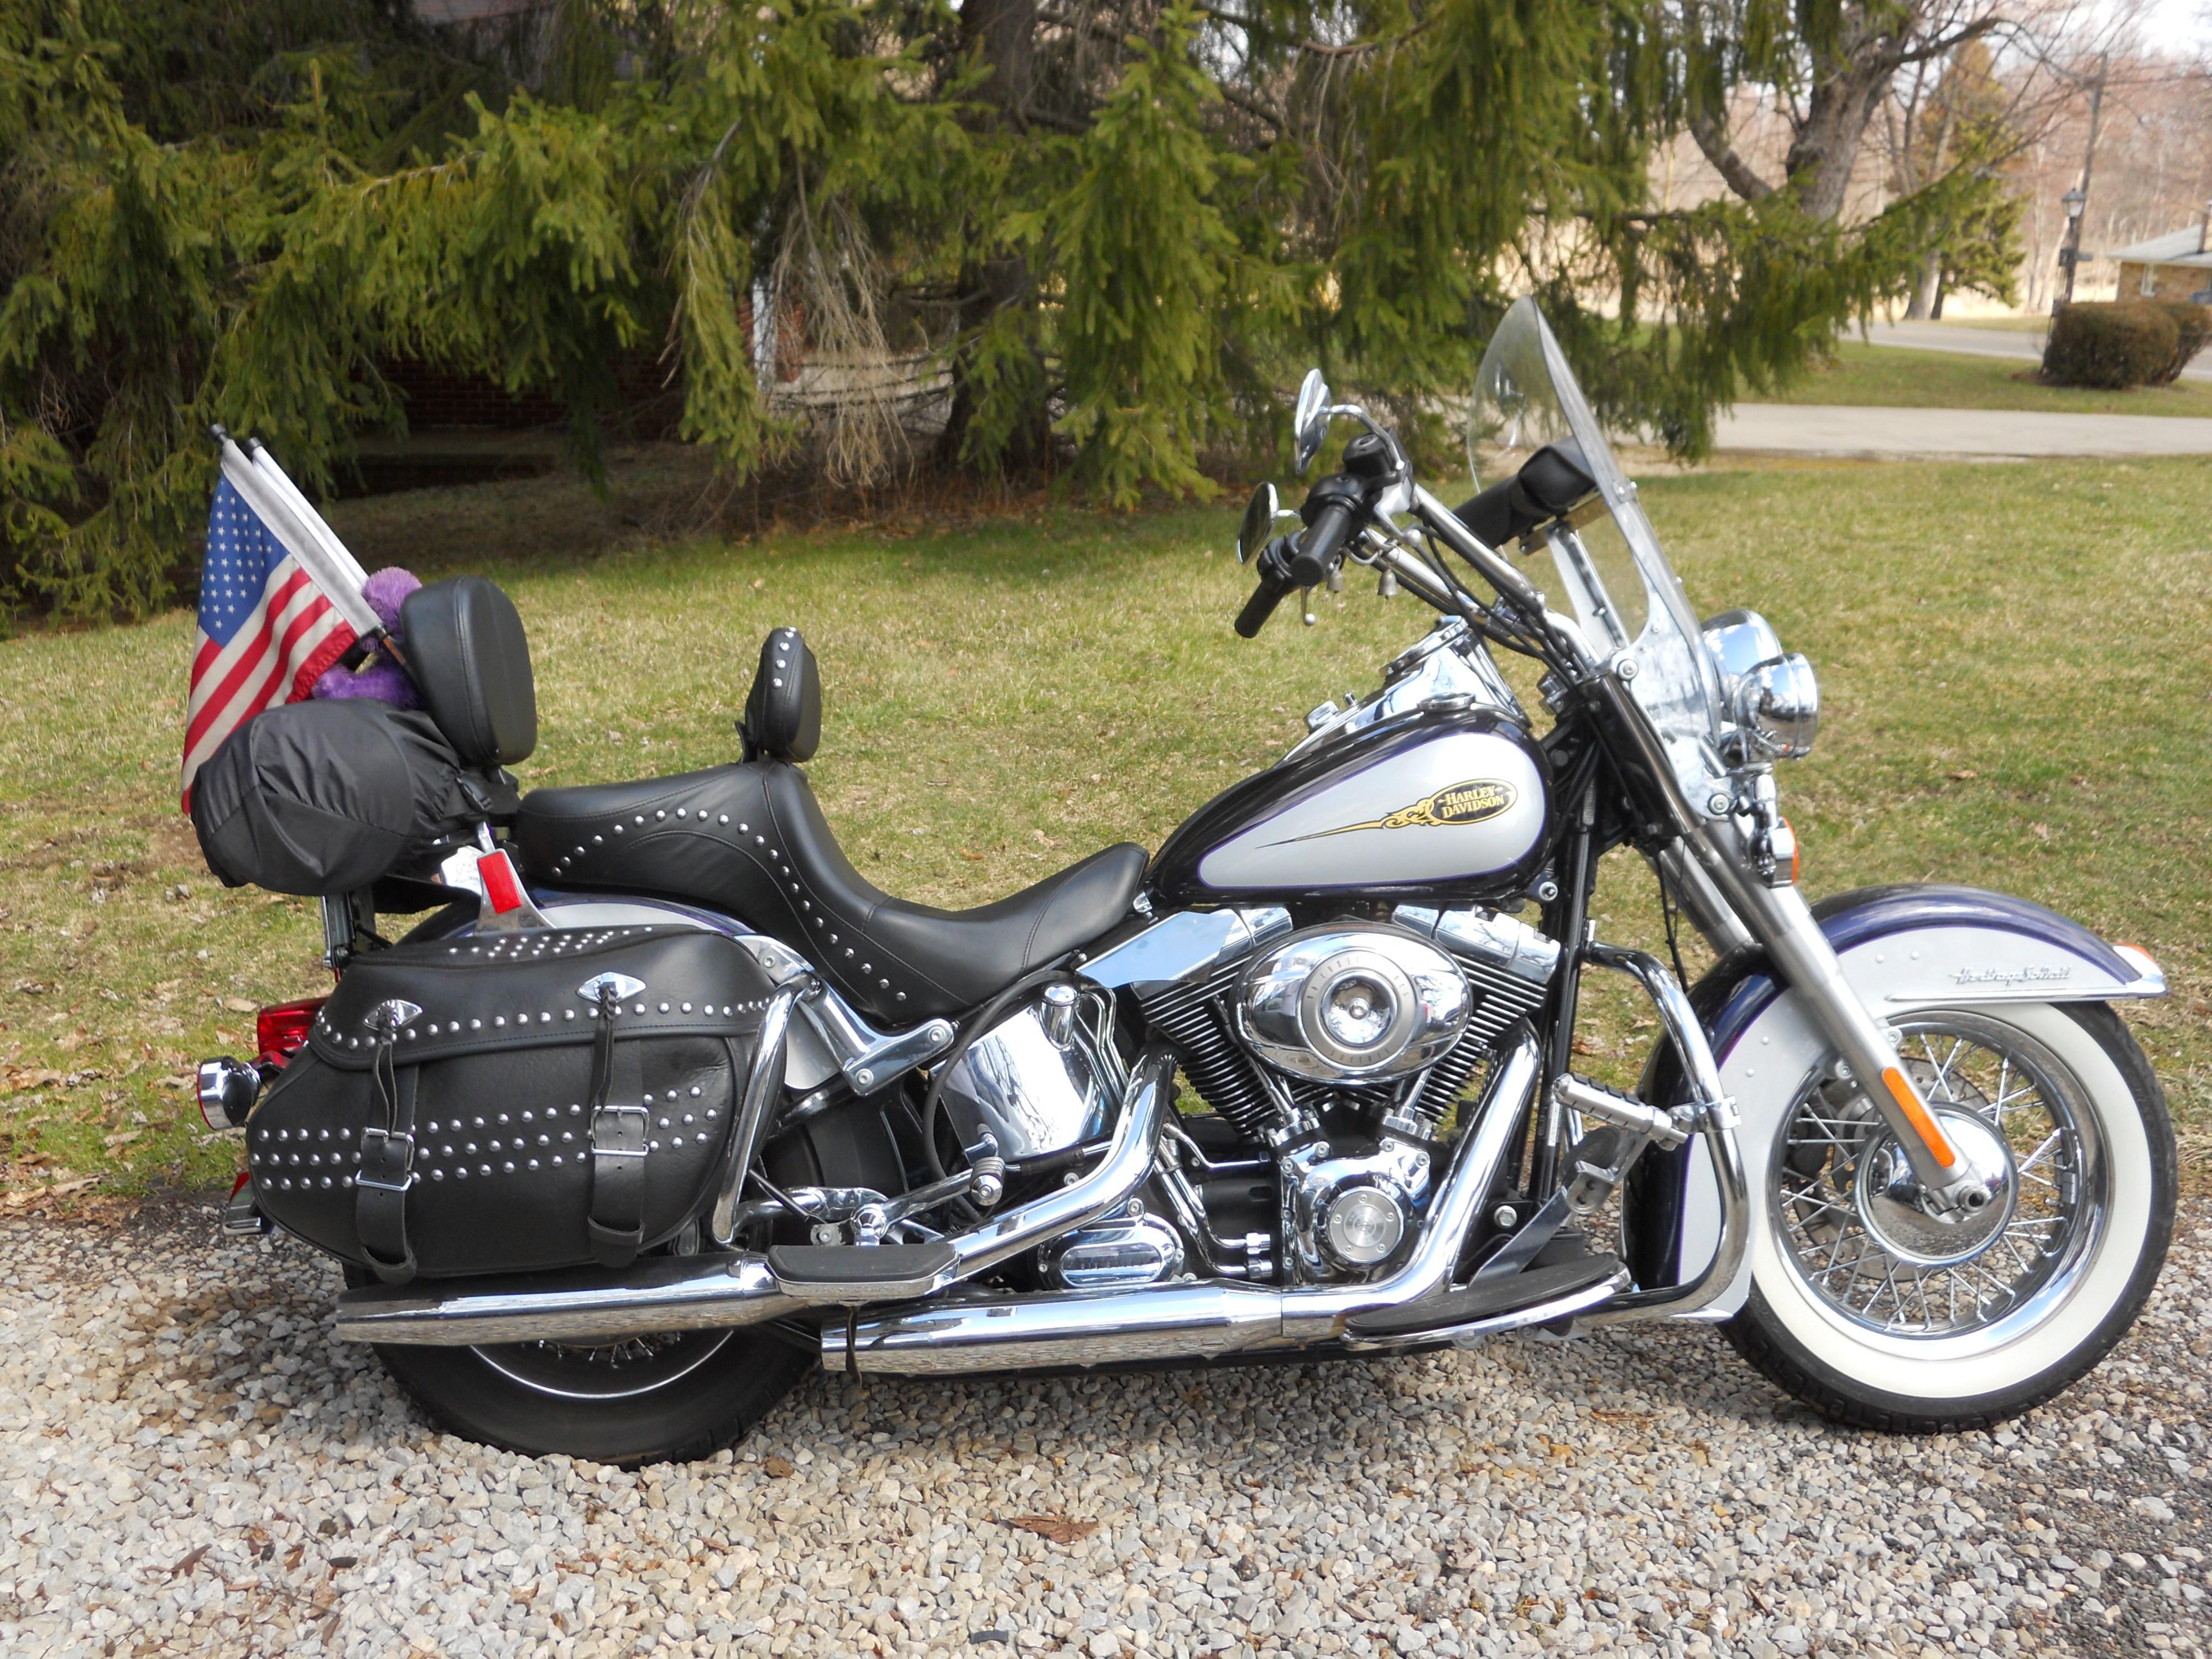 Motorcycle Dealer Orlando Fl >> 2009 Harley-Davidson® FLSTC Heritage Softail® Classic (Metallic purple & diamond ice), Hartville ...